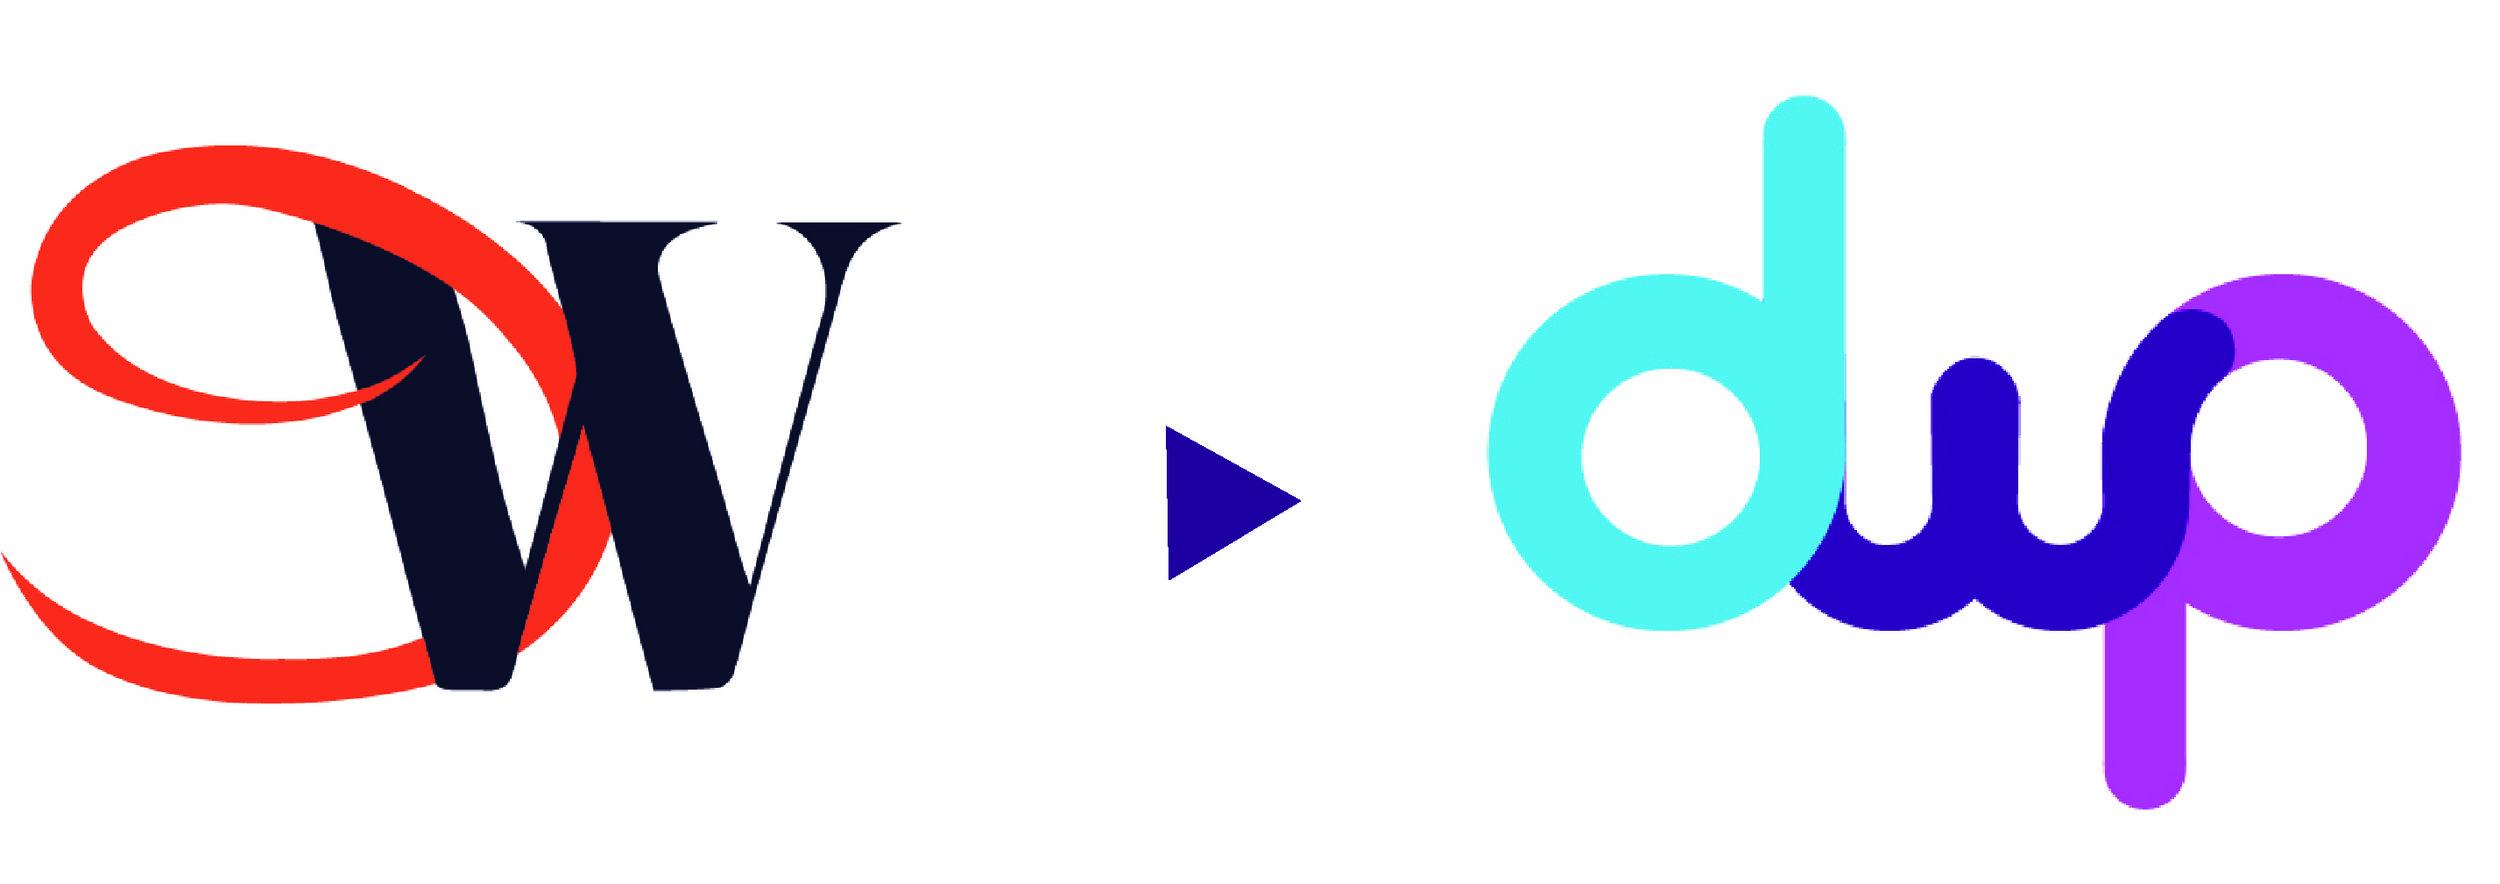 logo compare.jpg